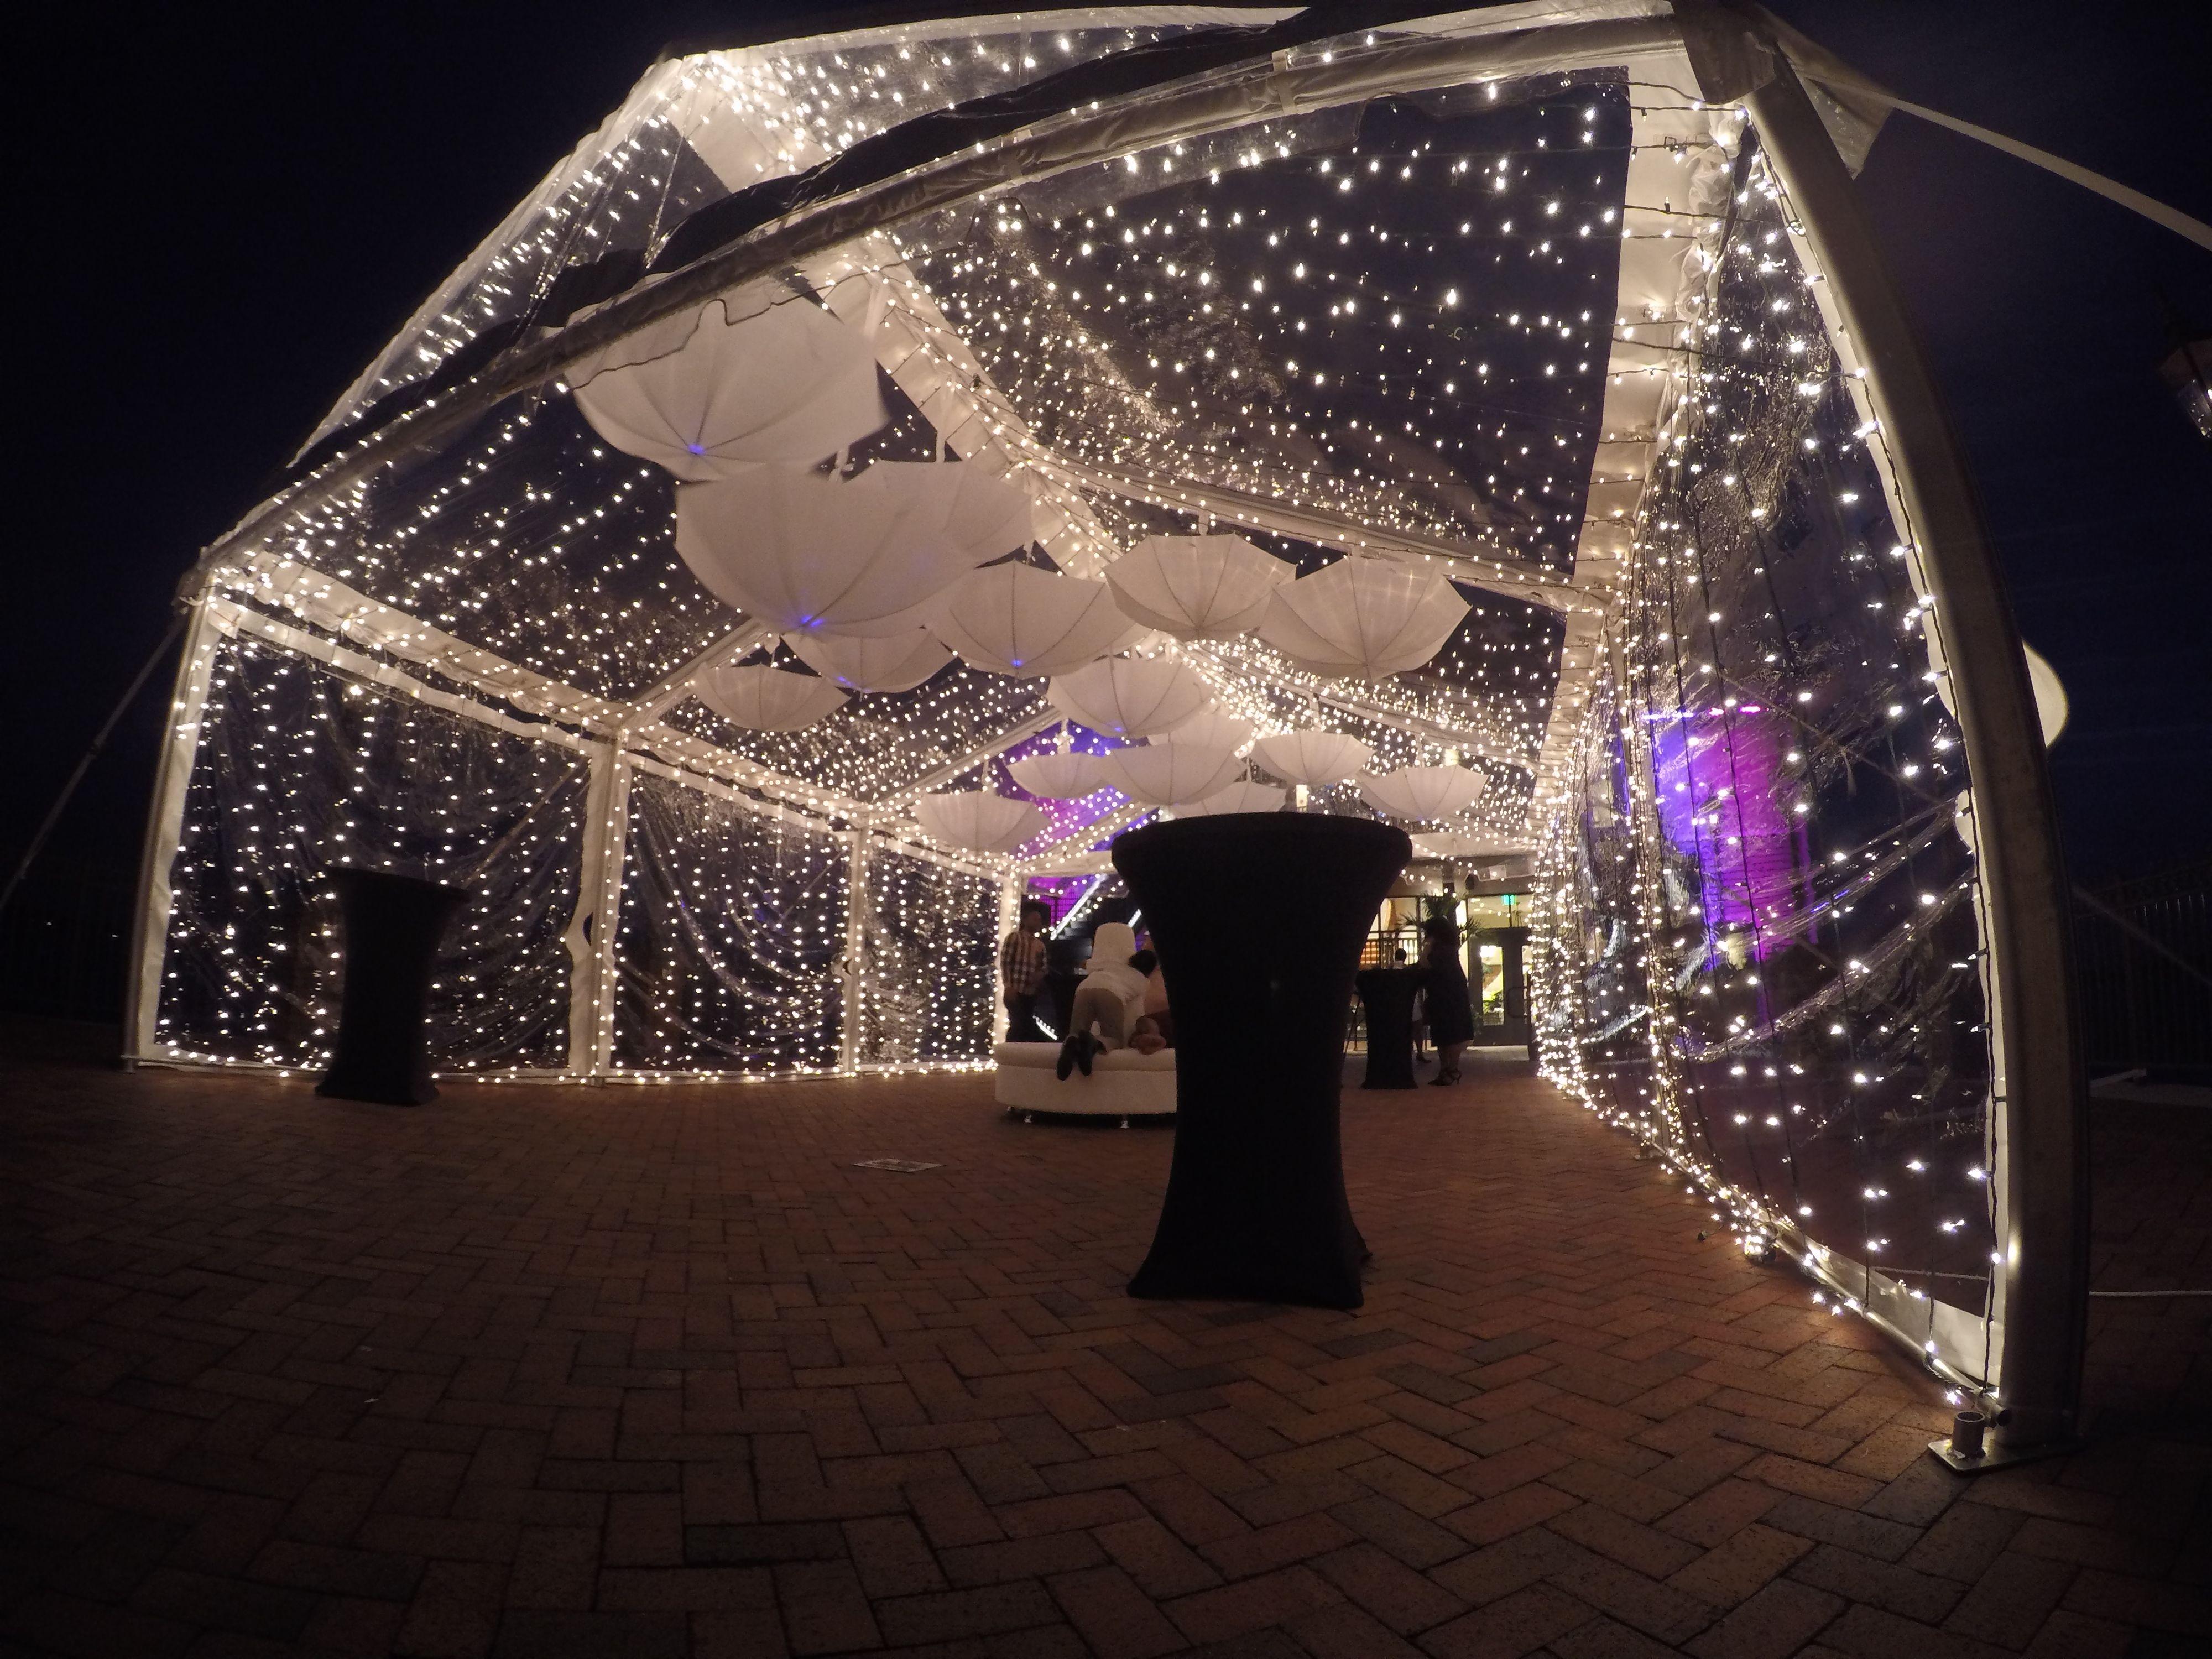 Tent Lighting Party tent wedding, Party tent rentals